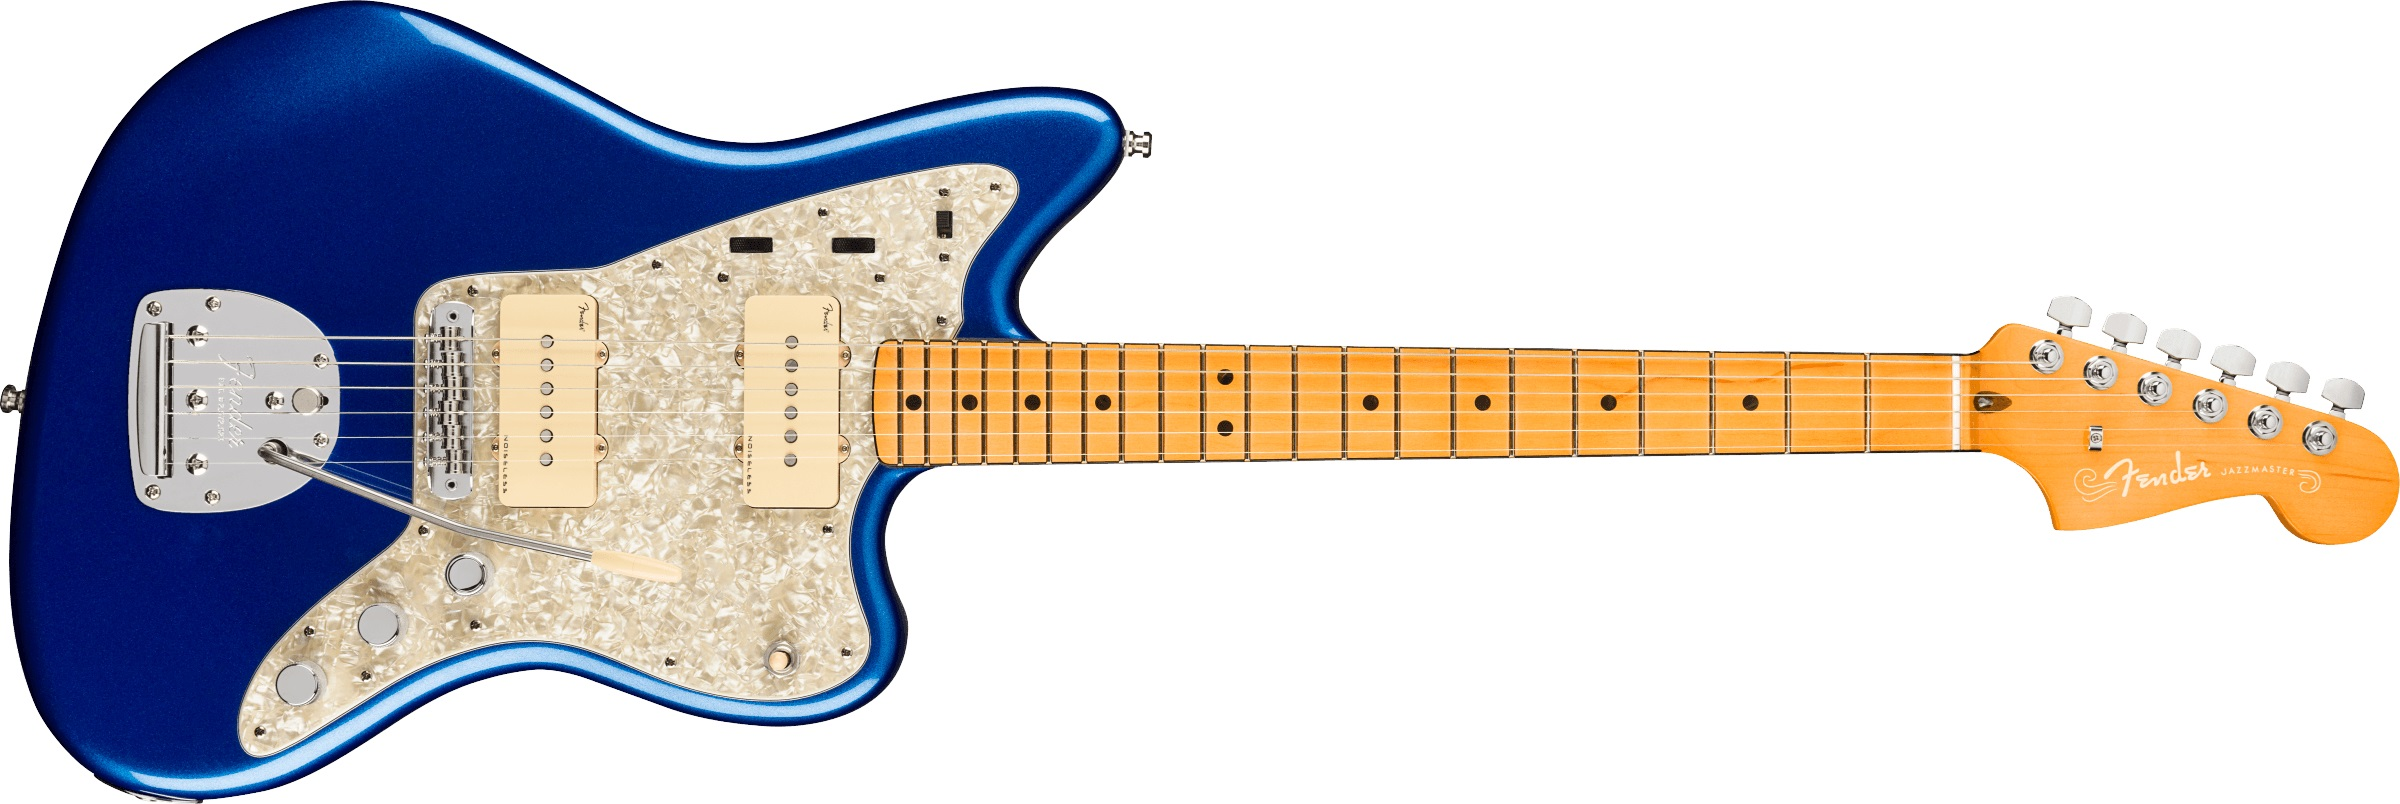 Fender American Ultra Jazzmaster MN CB